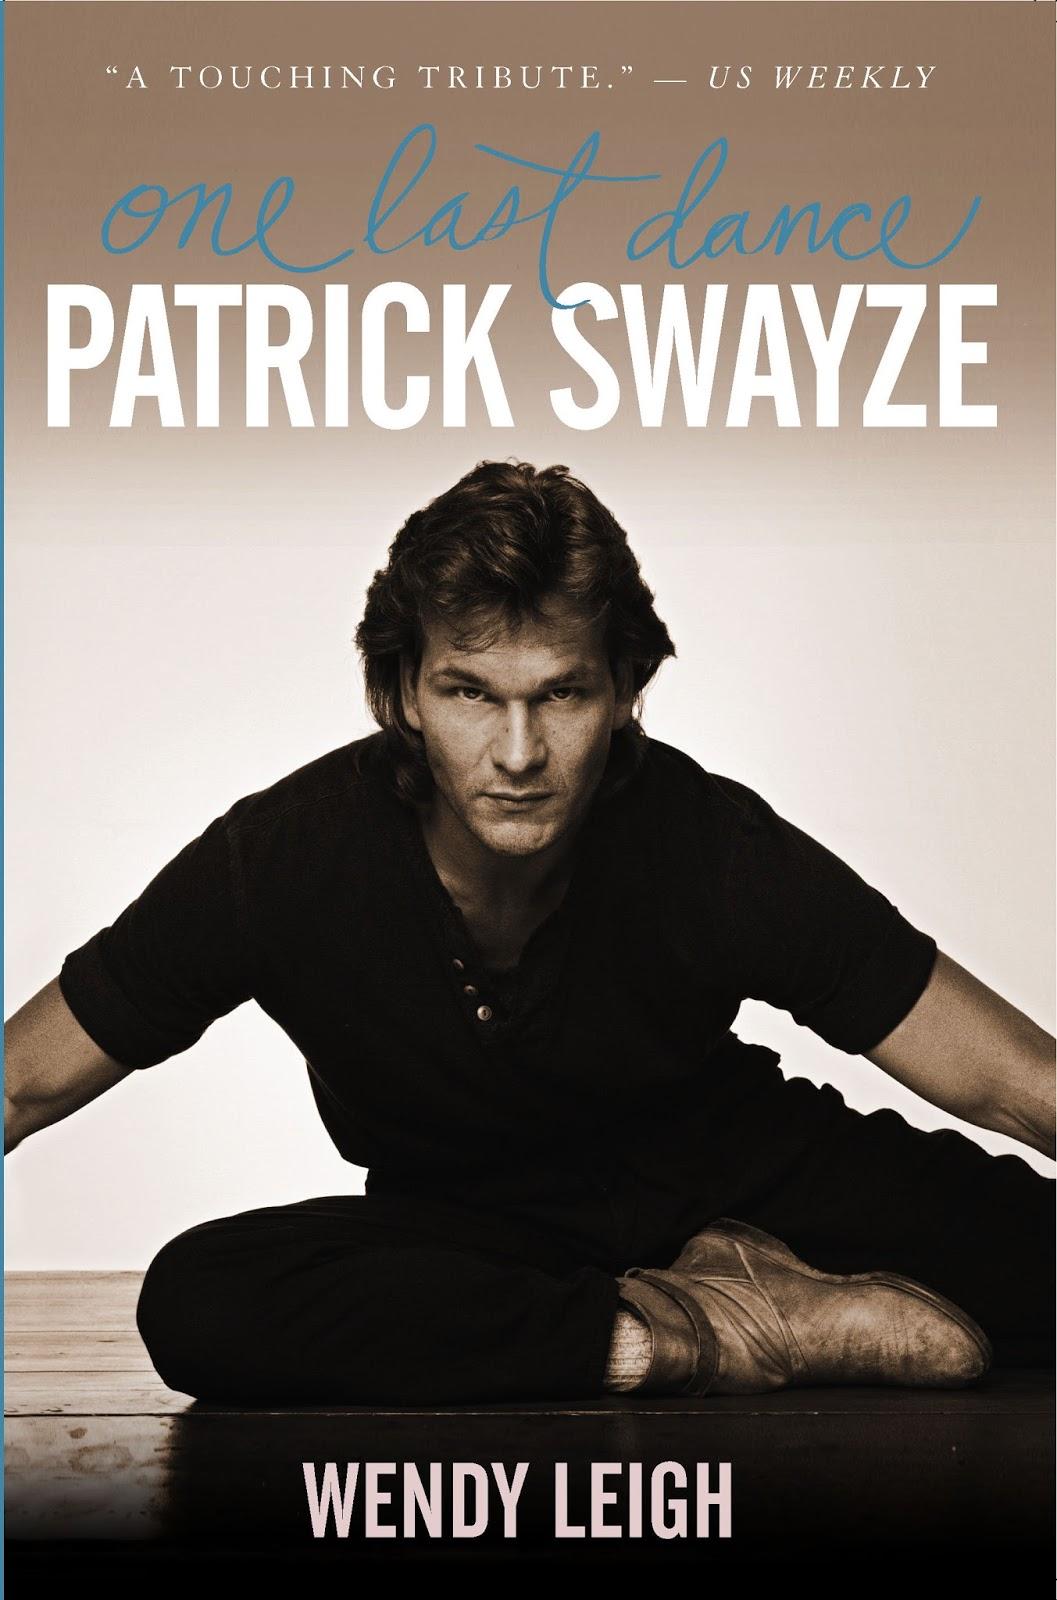 Dirty Dancing Analysis: Patrick Swayze: One Last Dance